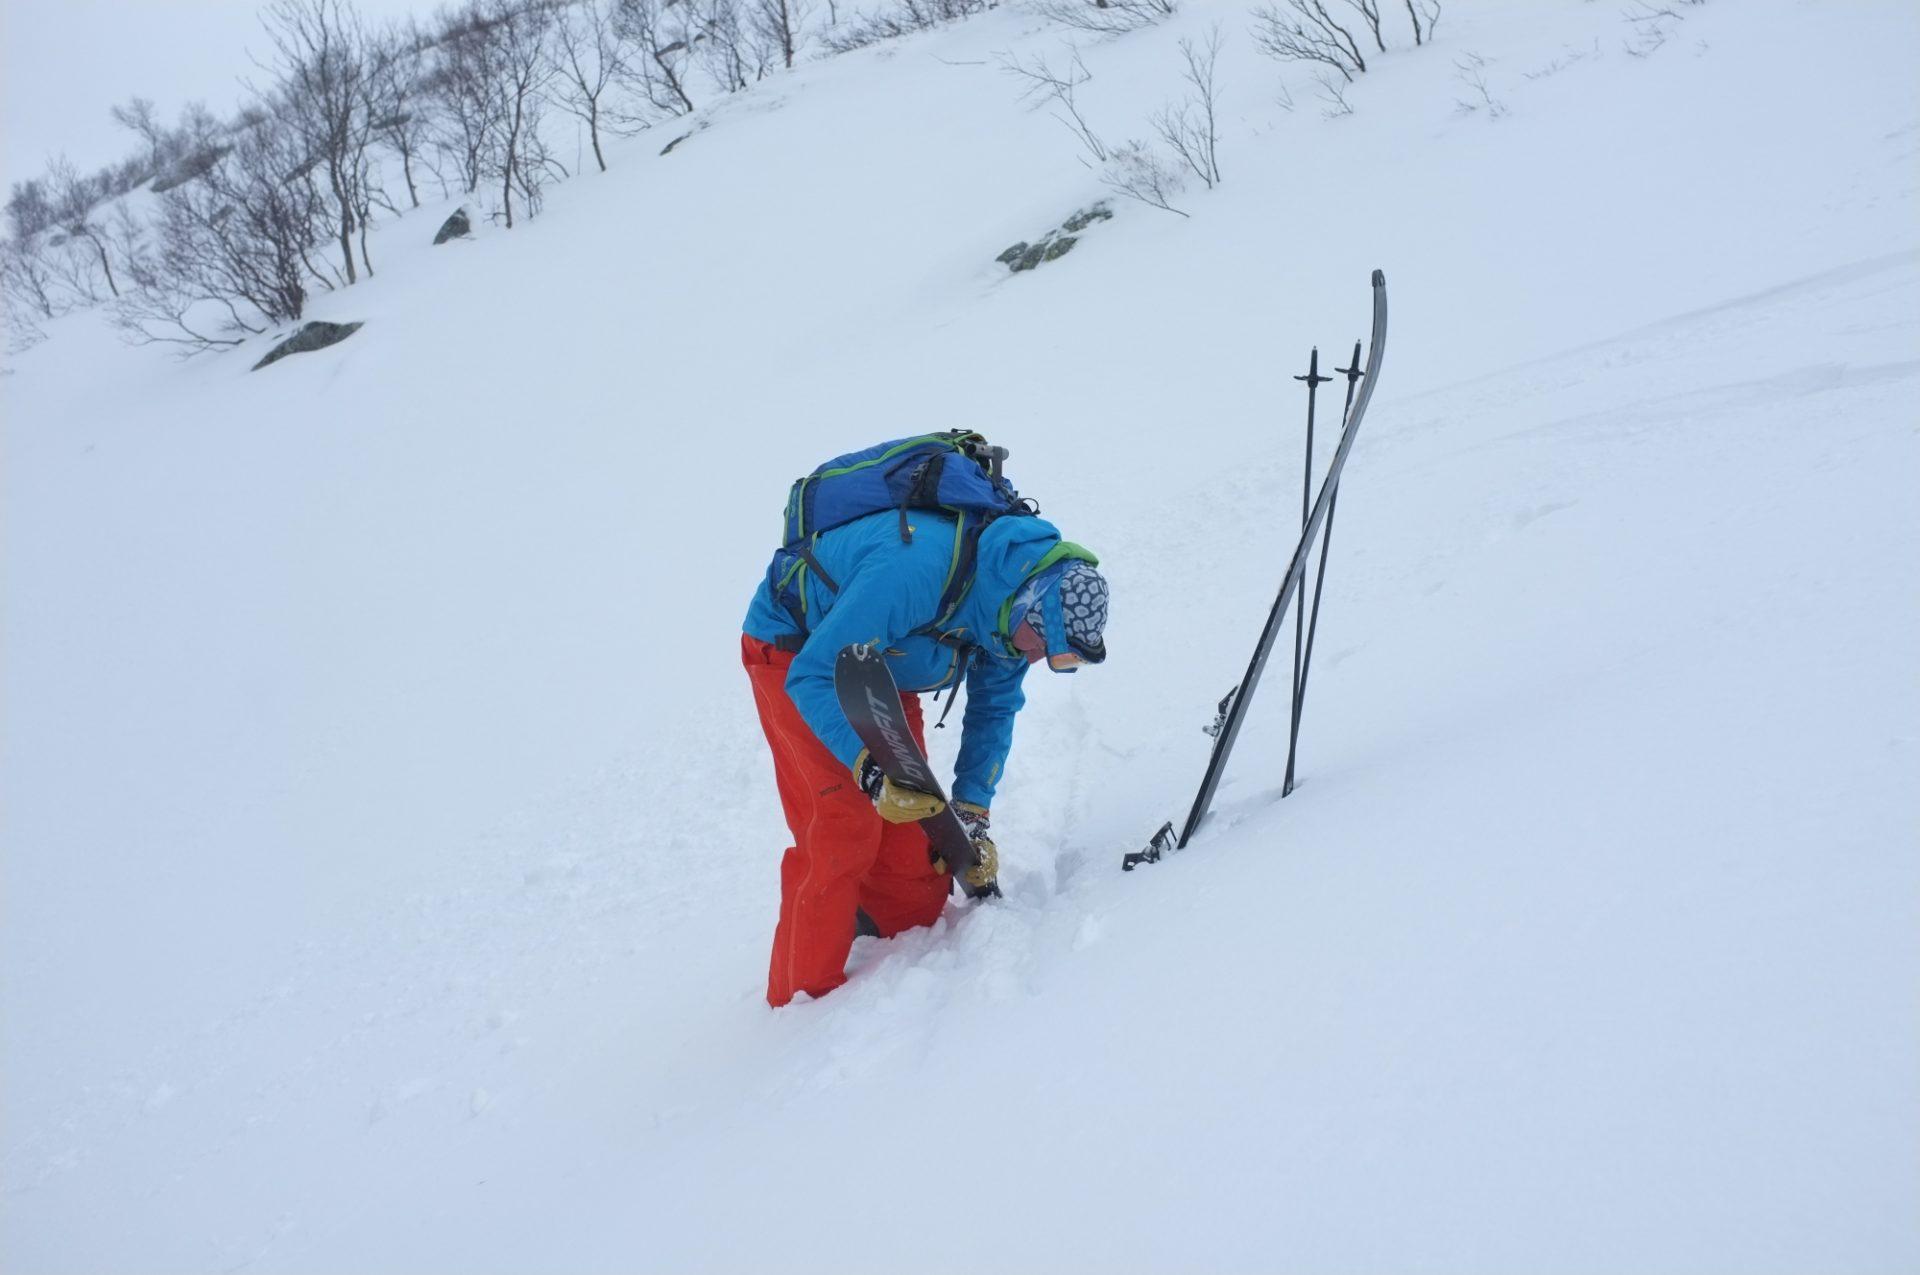 Bergsteigertipp Ski anziehen 1 I (c) Peter Plattner